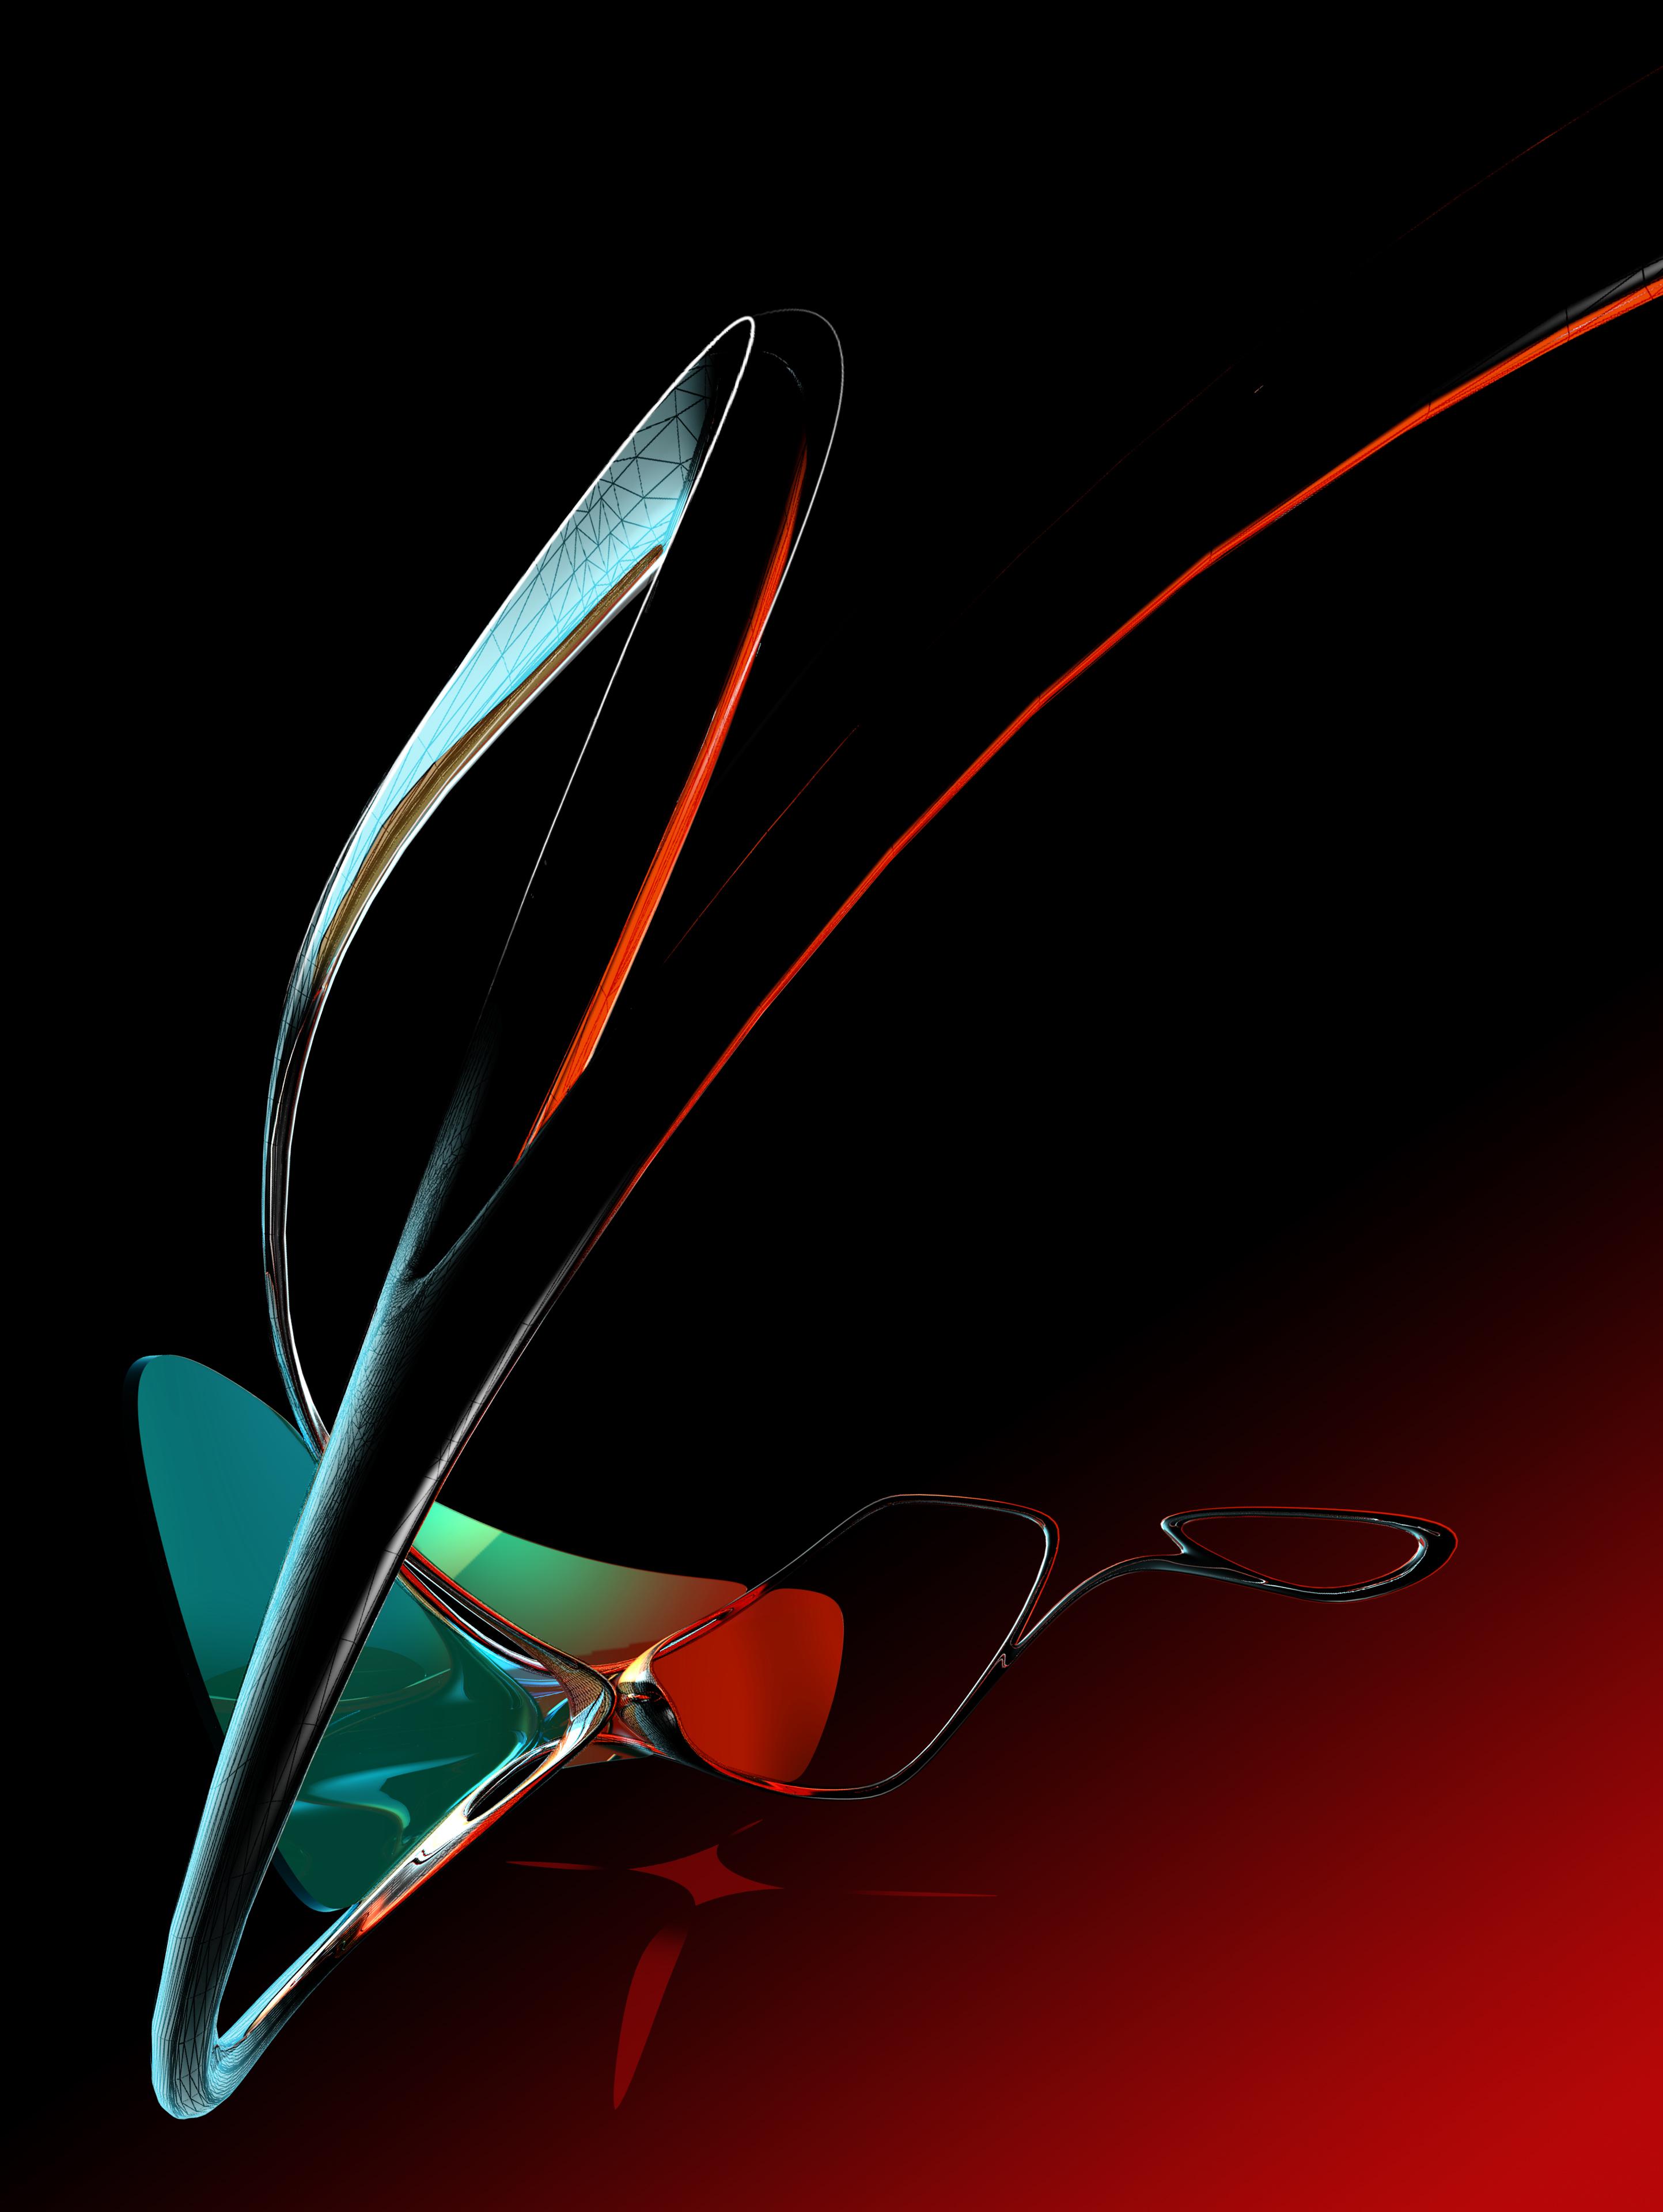 A close up of Zaha Hadid Design x The Owner futuristic collaboration